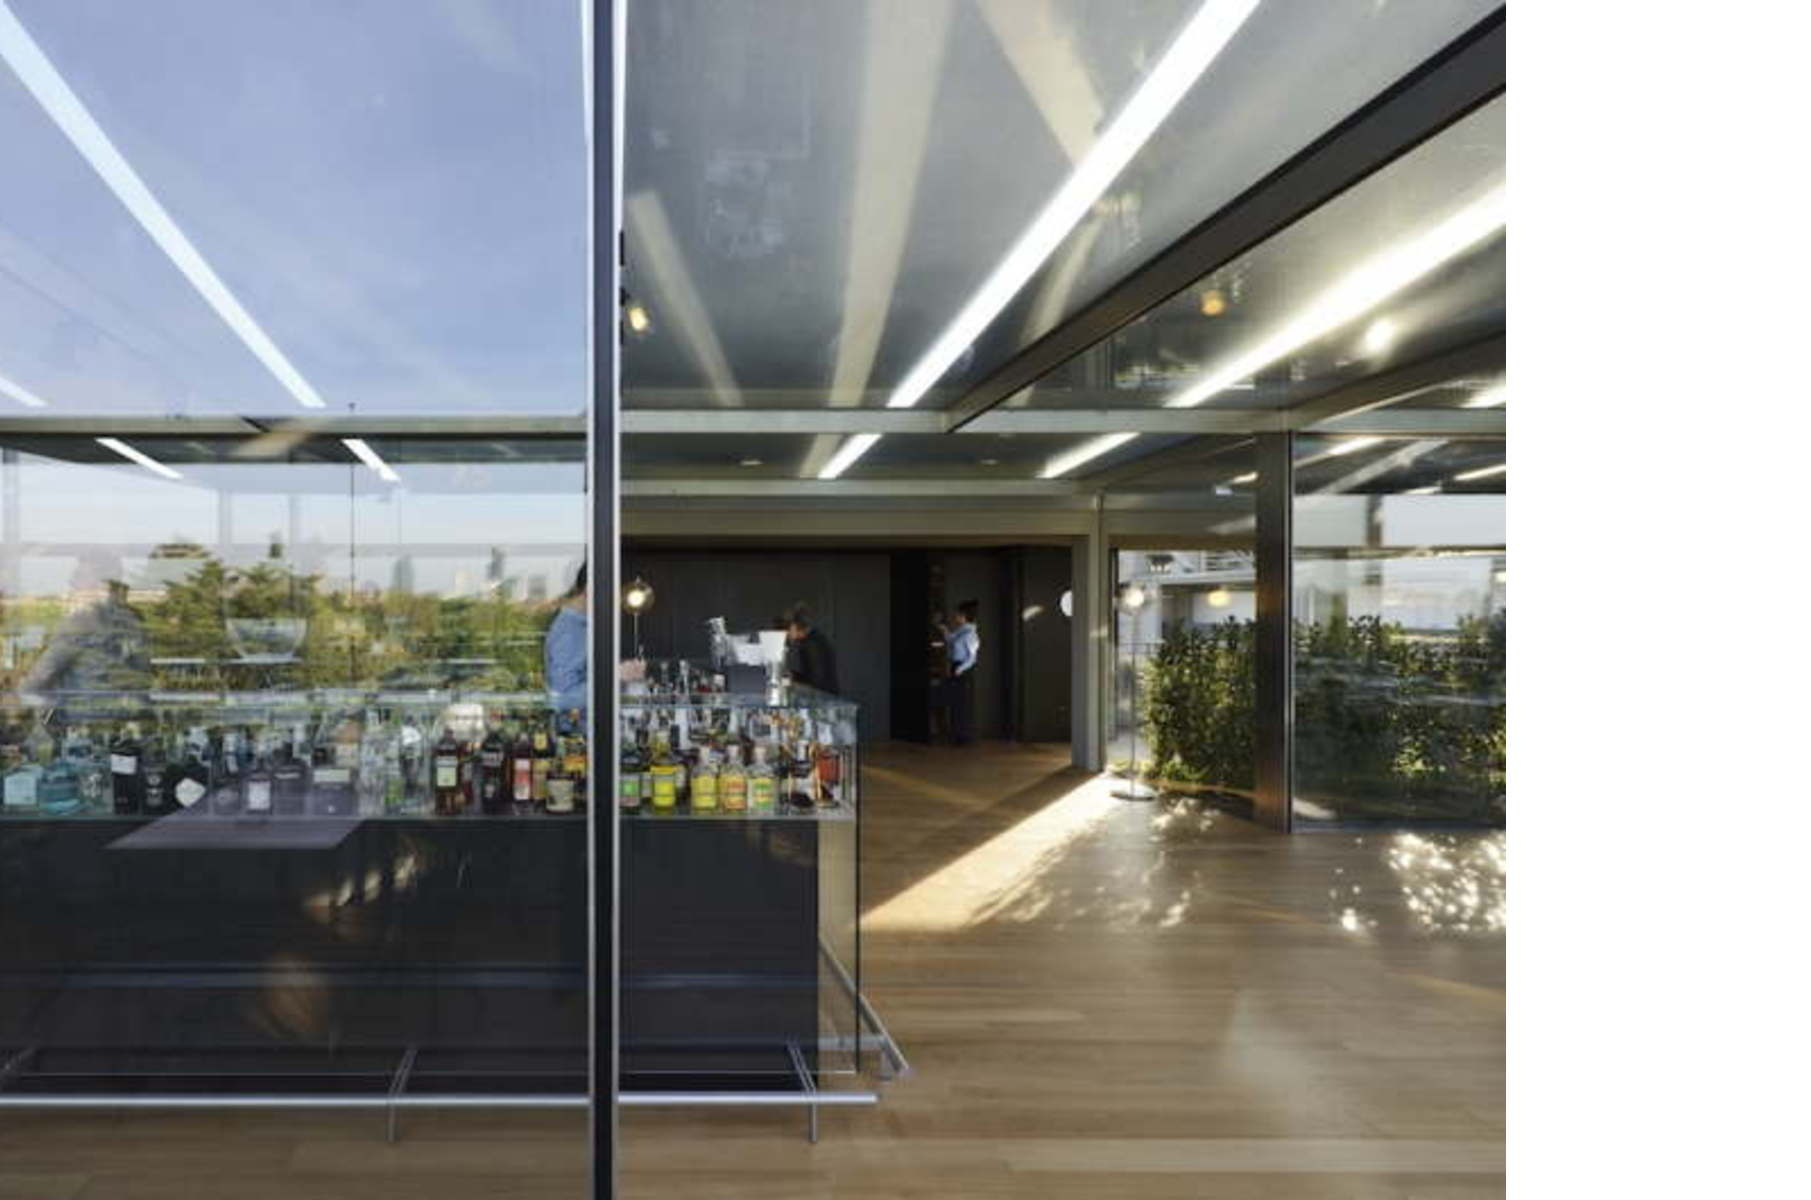 OBR Restaurant Terrazza Triennale Milano | Floornature